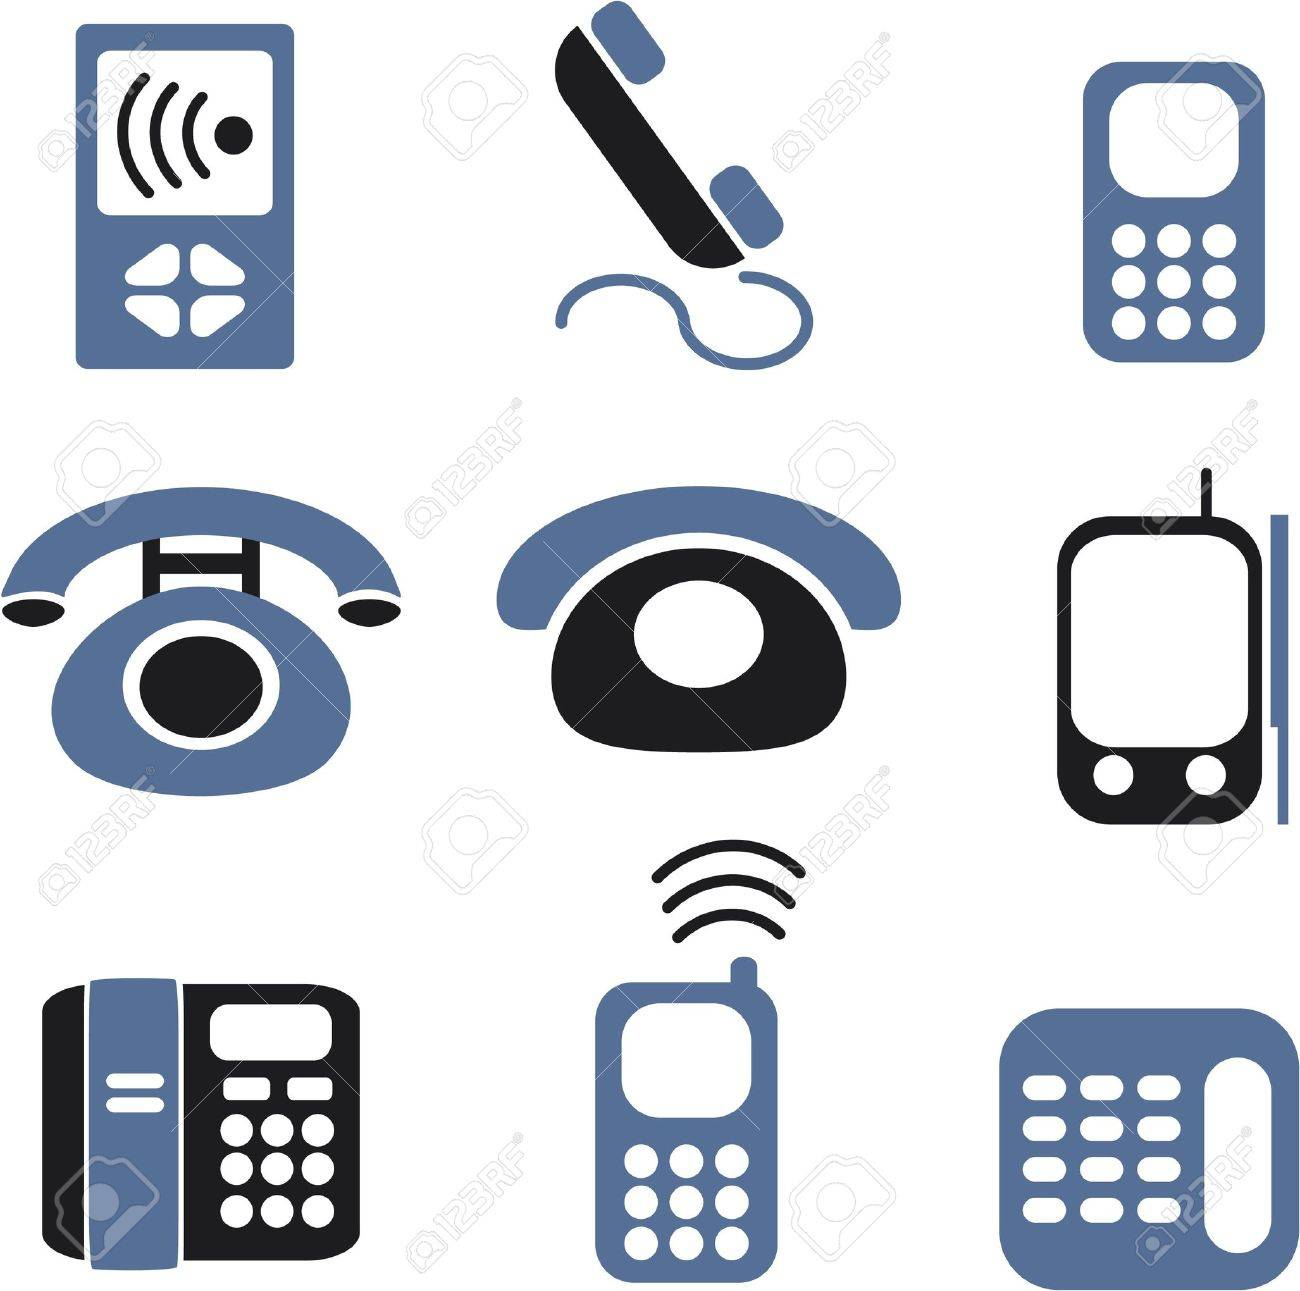 phones signs Stock Vector - 8953077